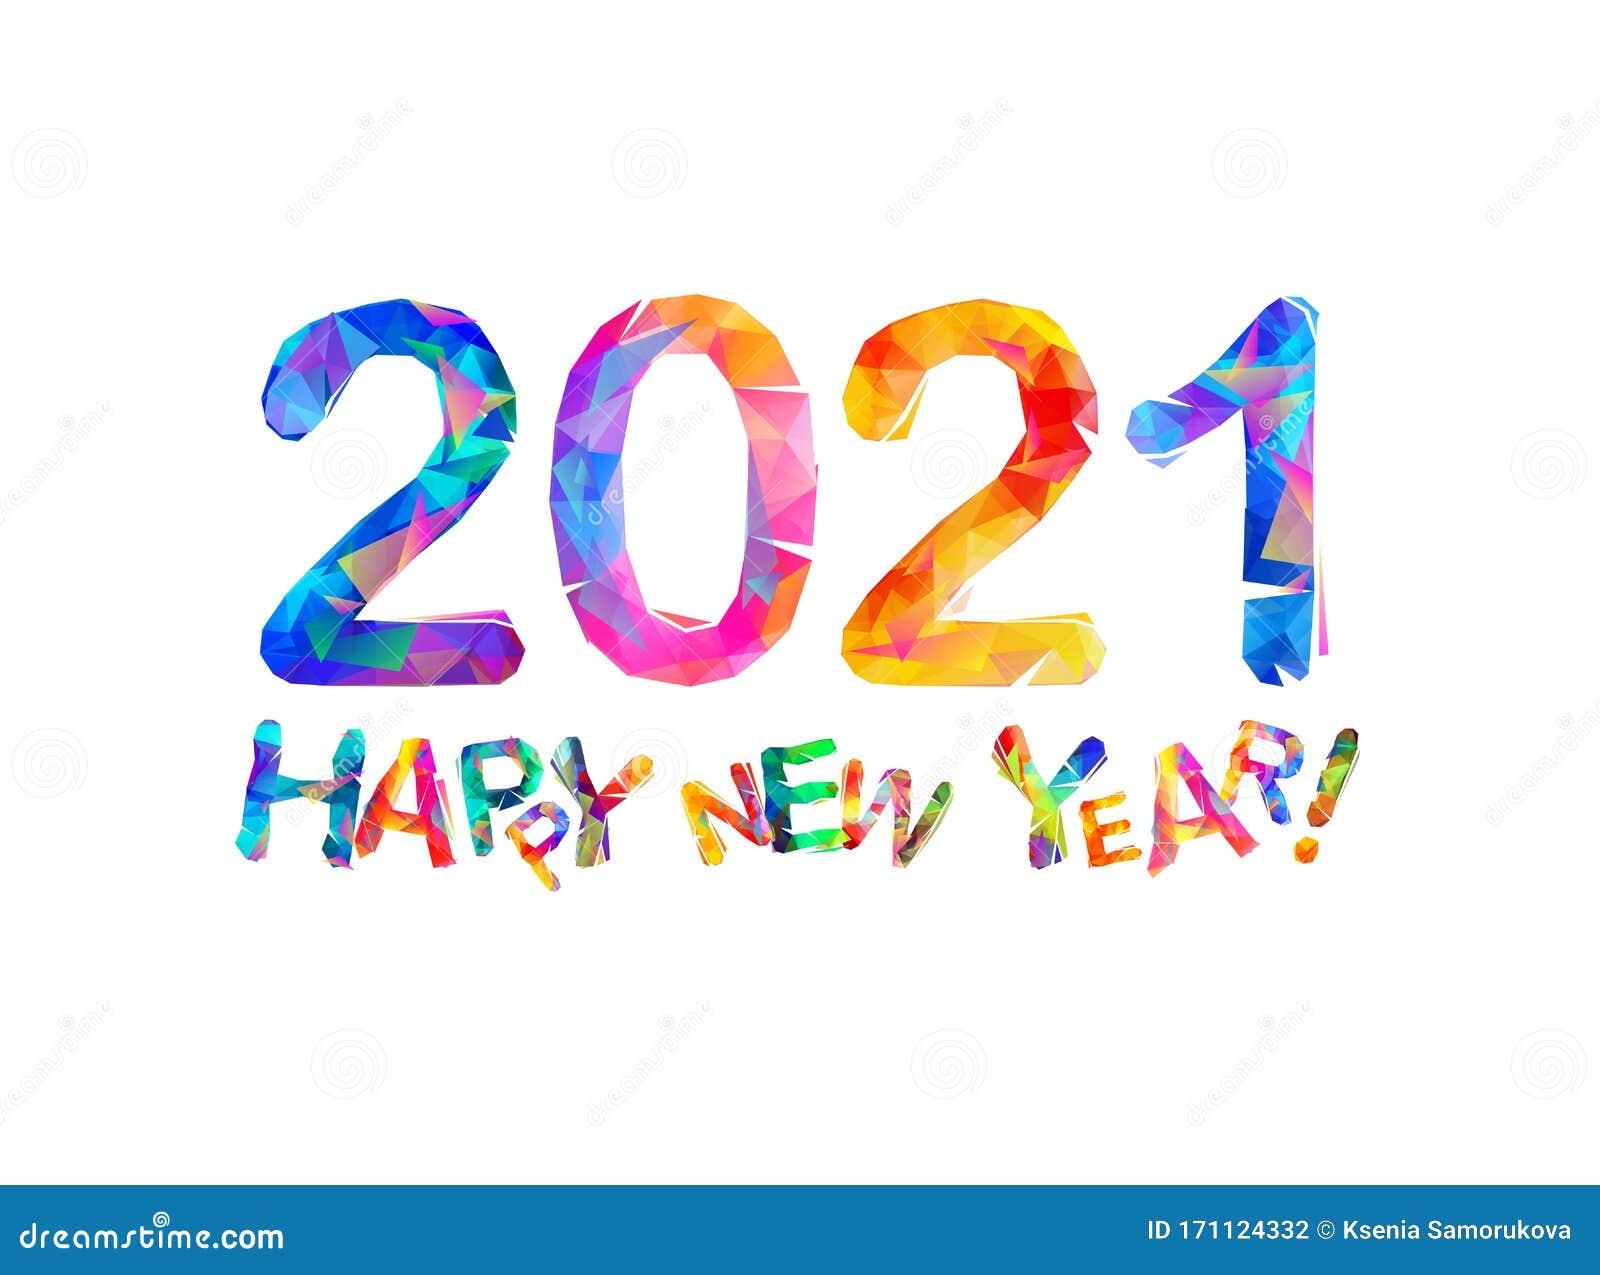 Congratulation Card Happy New Year 2021 Stock Vector Illustration Of Celebrate Symbol 171124332